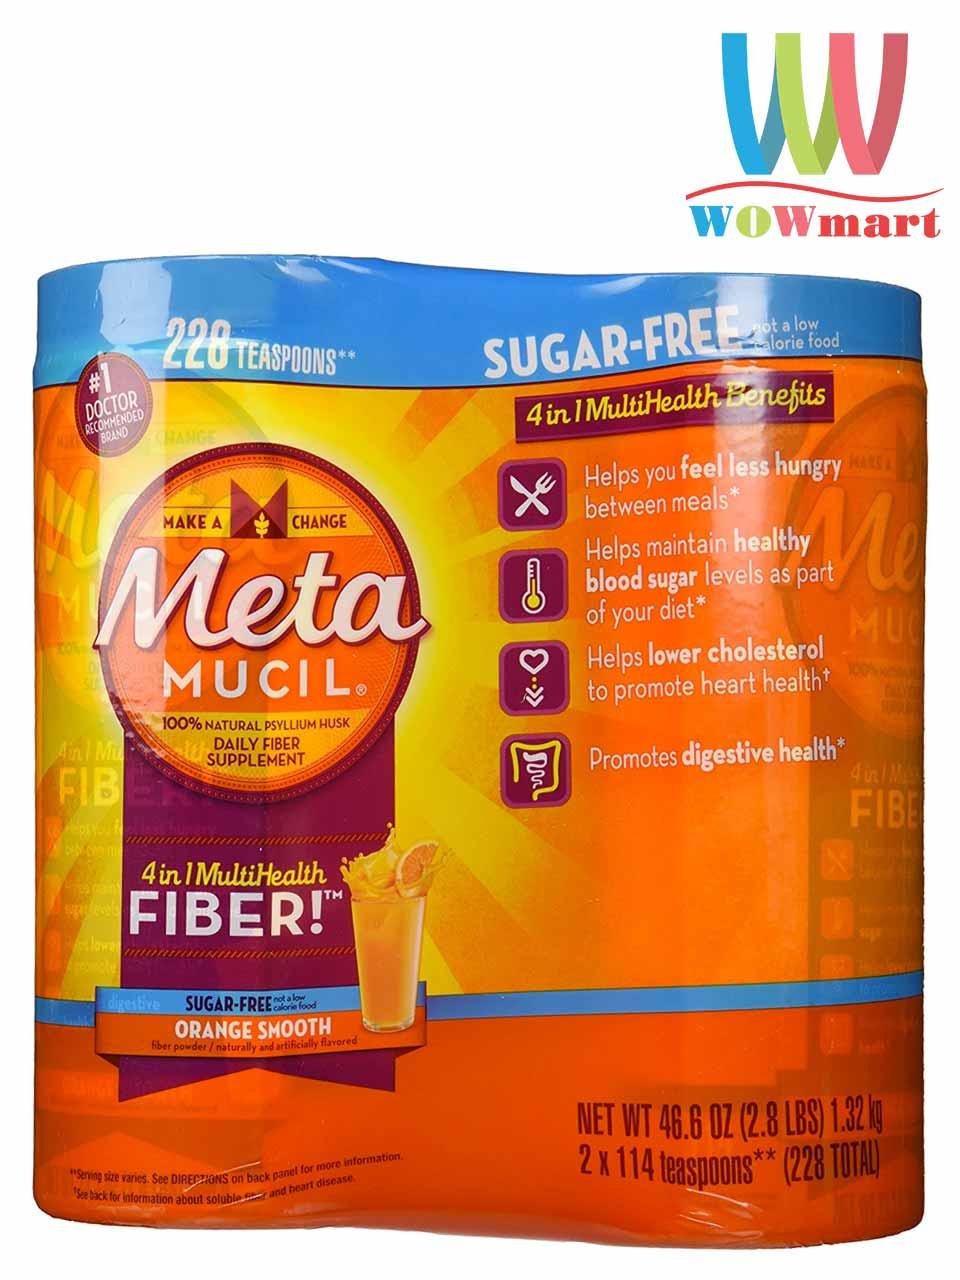 bot-hoa-tan-tot-cho-suc-khoe-metamucil-multihealth-fiber-sugar-free-260-lieu-luong-1